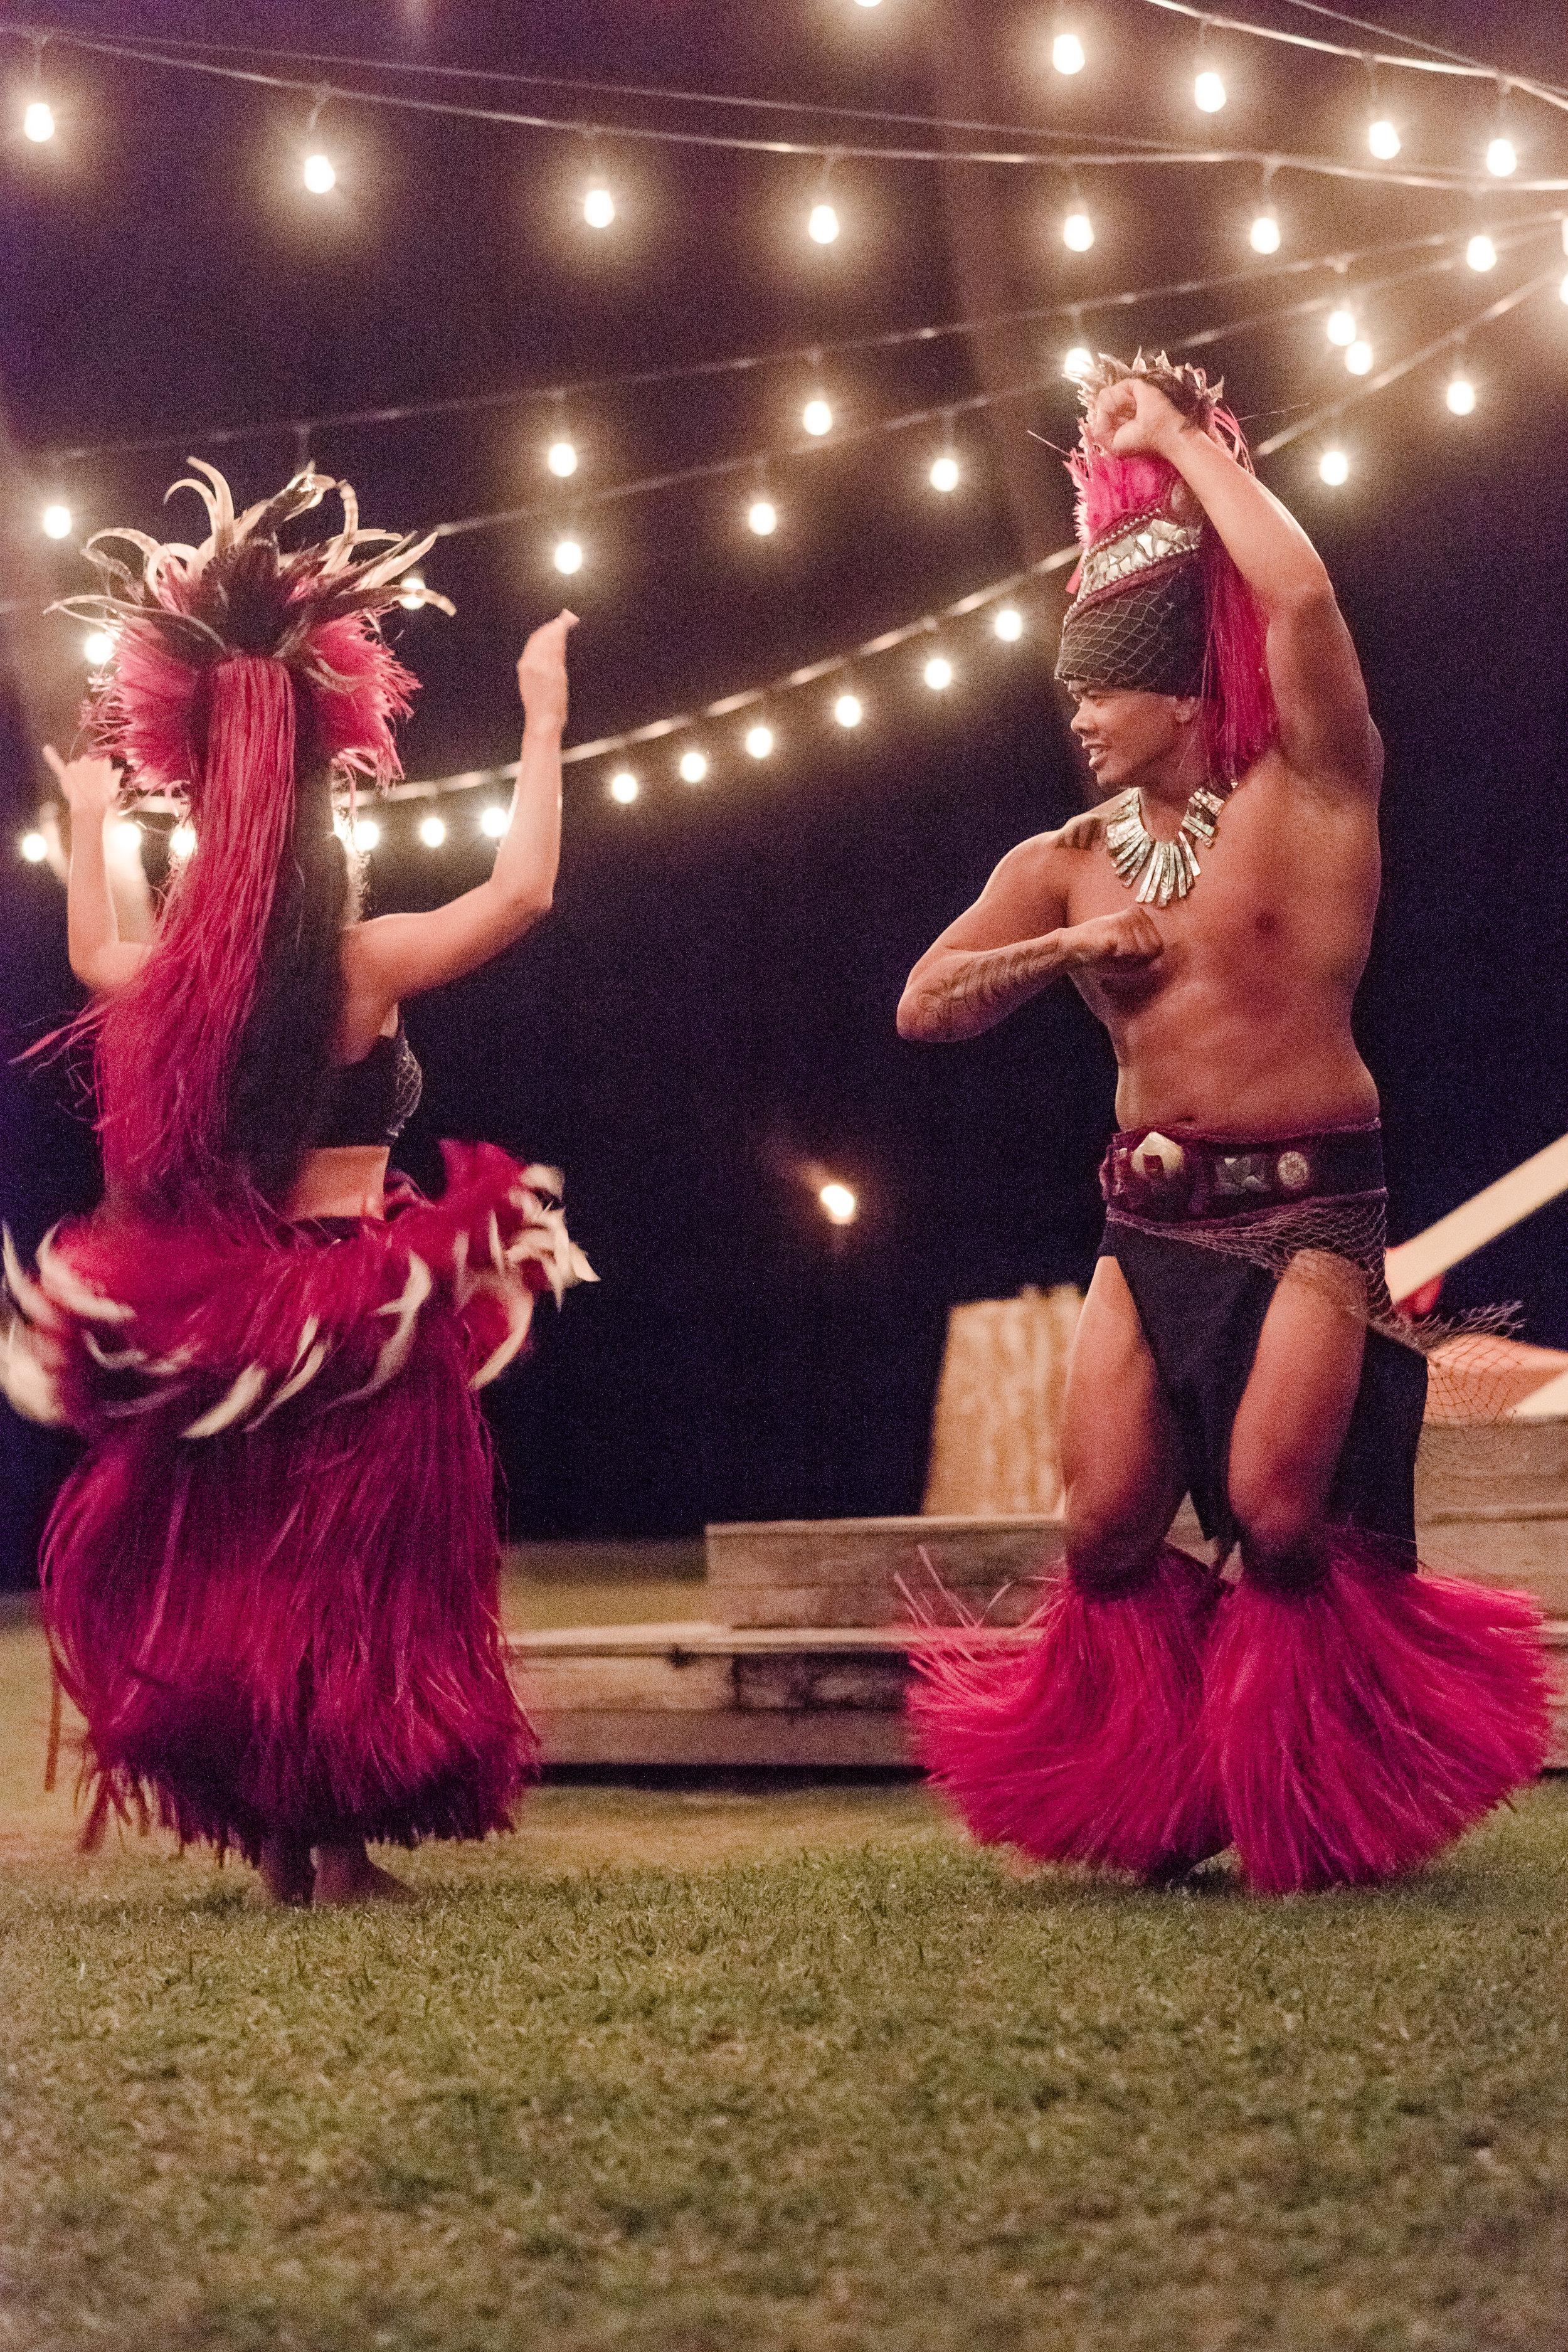 177-1037-HMR-Maui-Wedding-3568.jpg